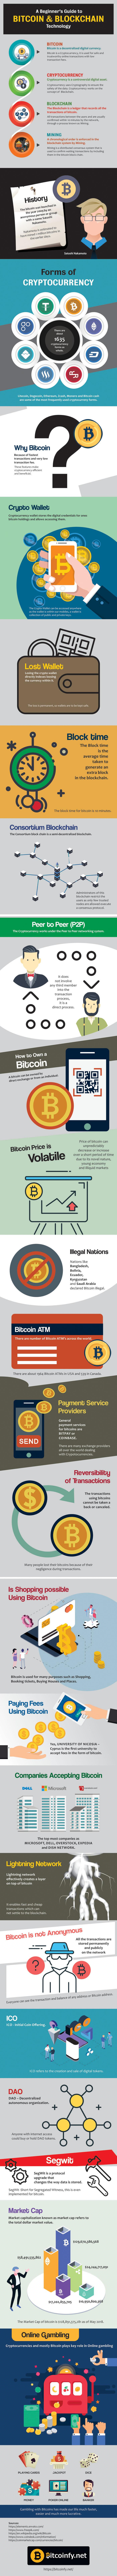 Bitcoin-Infographic_final